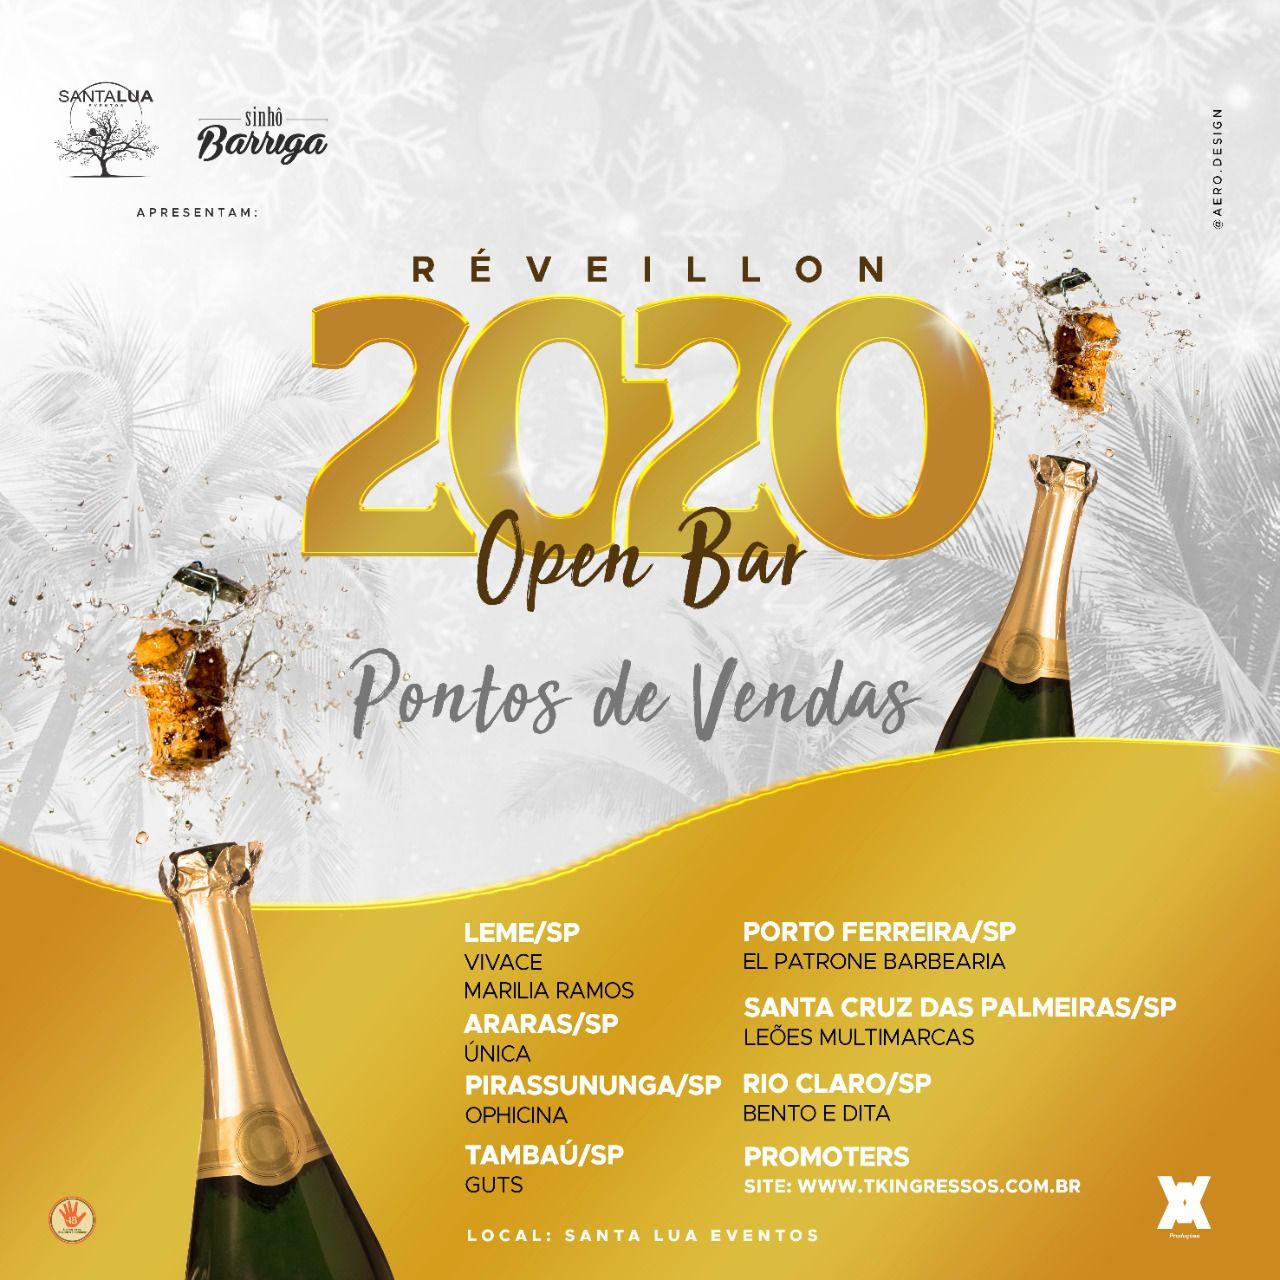 Réveillon 2020 Open Bar - Sinhô Barriga - 31/12/19 - Leme - SP